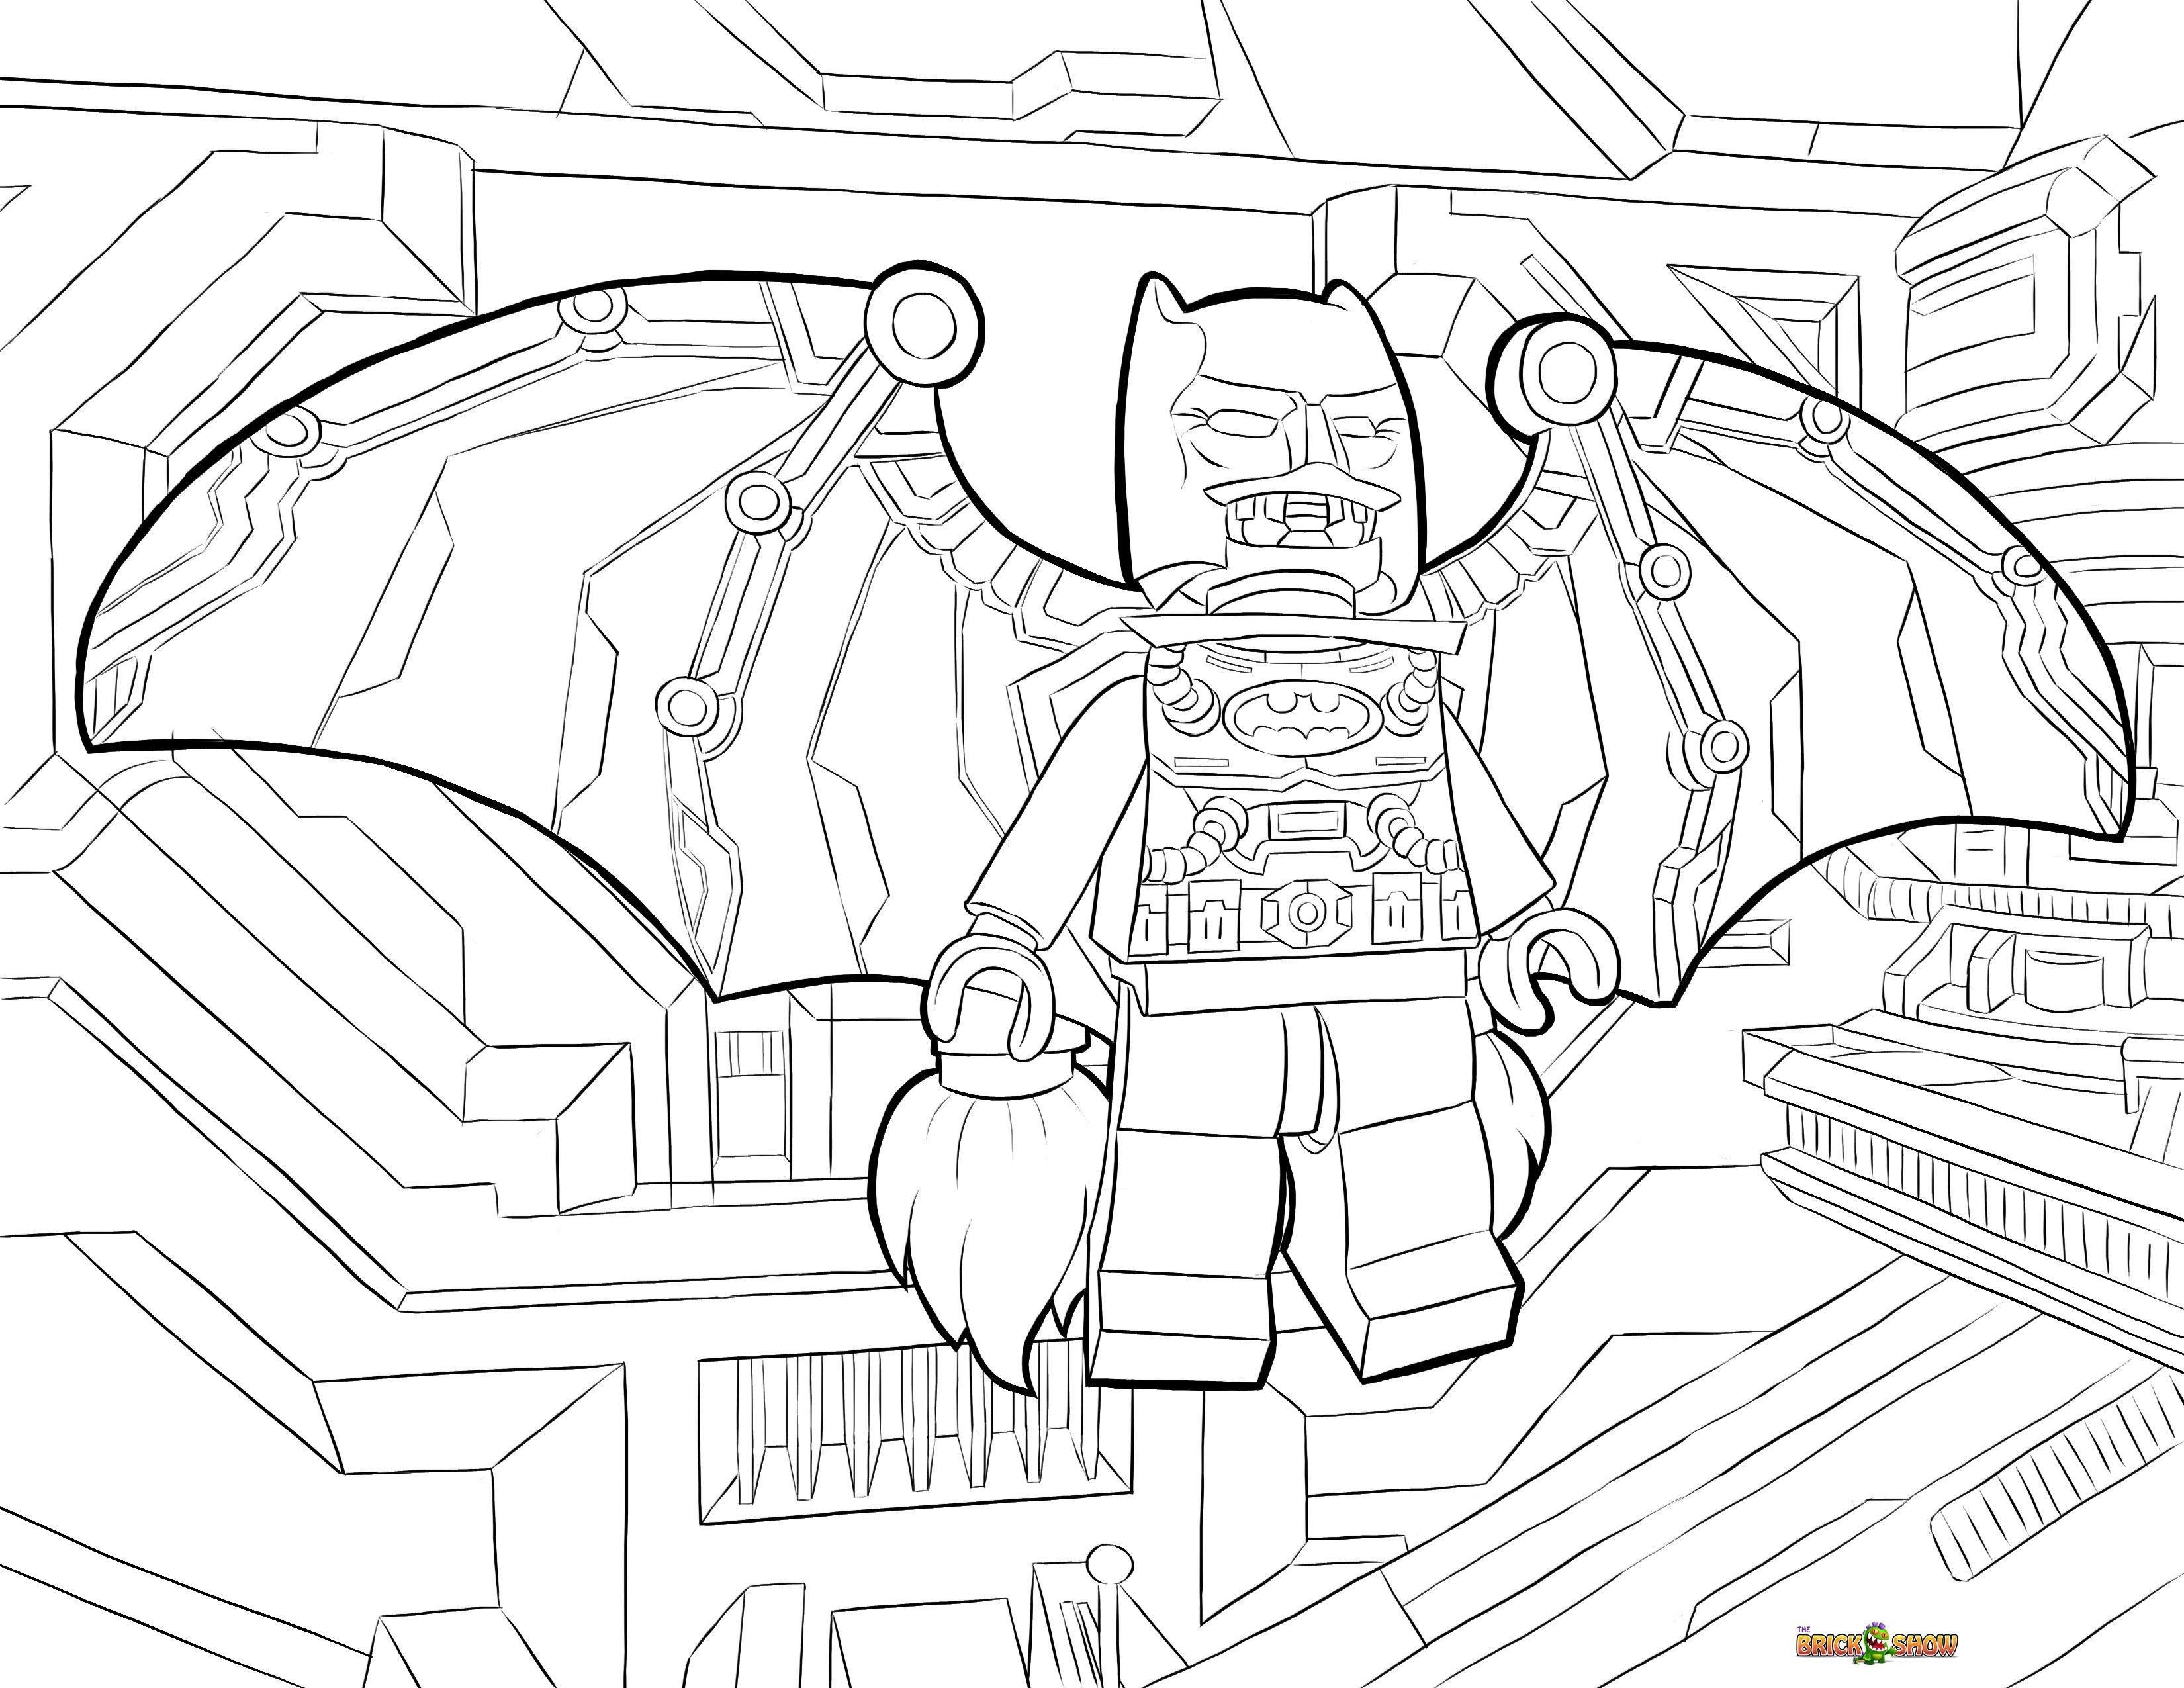 Lego_Batman_Coloring_Page_7.jpg (3300×2550) | Coloring 4 Kids: DC ...